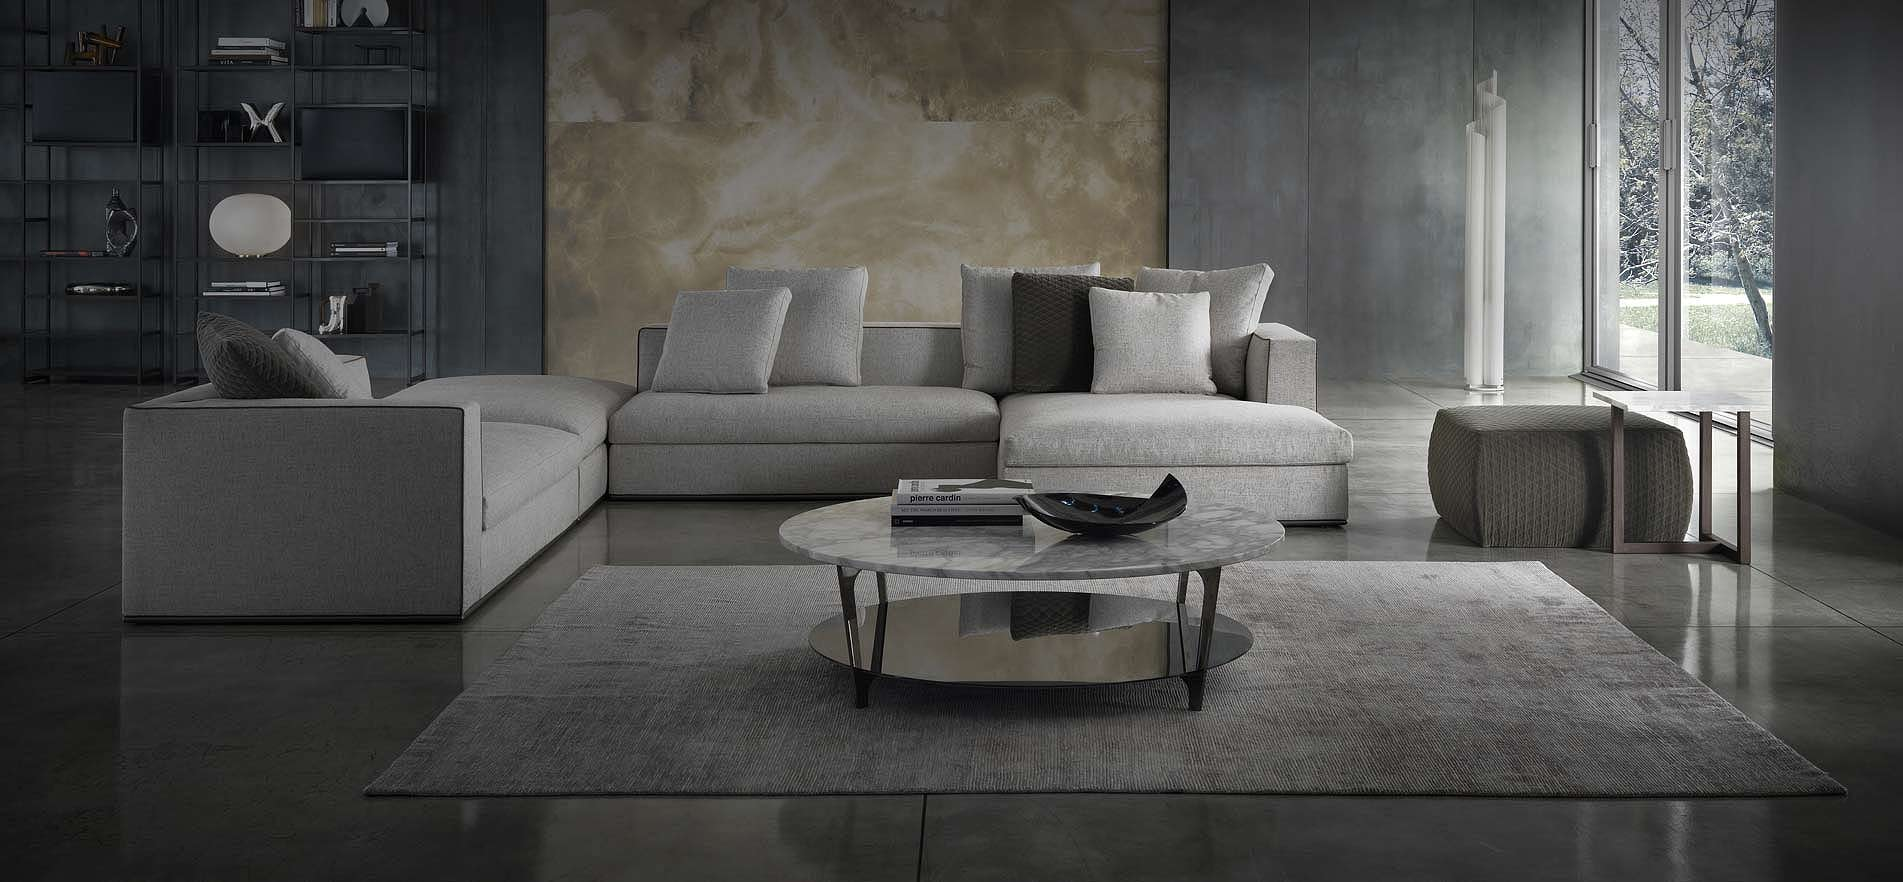 giulio marelli m bel h ndler couchtische online kaufen. Black Bedroom Furniture Sets. Home Design Ideas